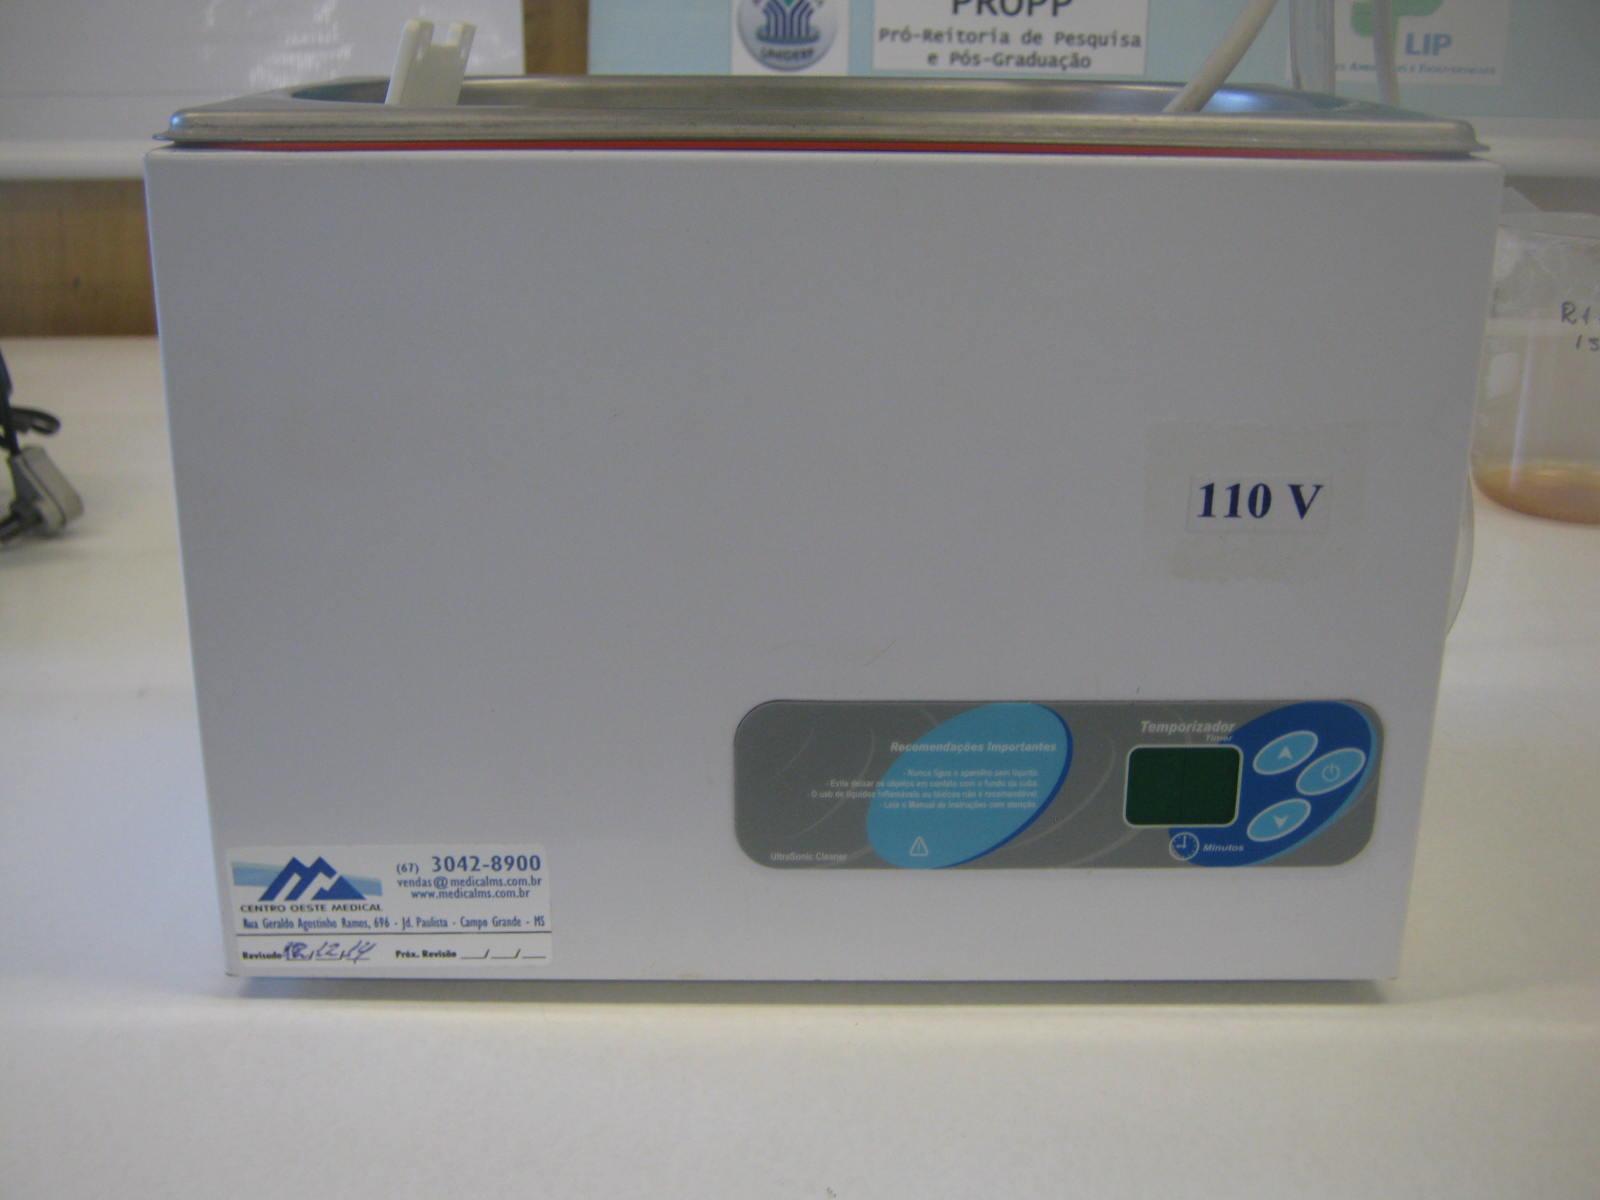 Banho Ultrasonic Cleaner